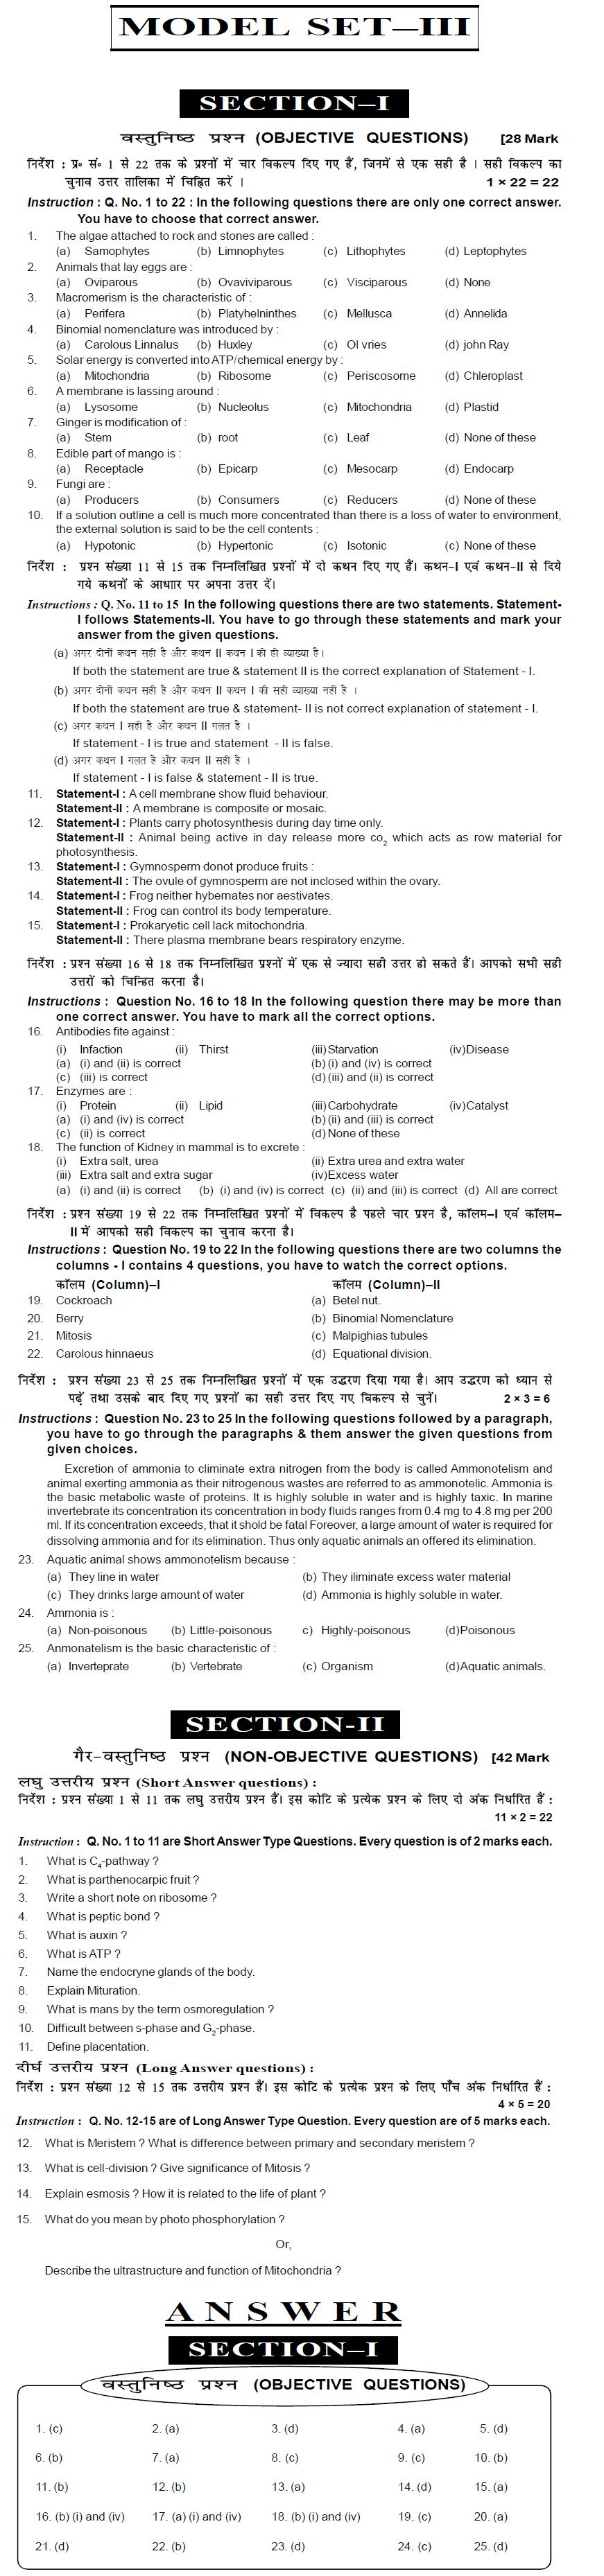 Bihar Board Class XI Science Model Question Papers - Biology